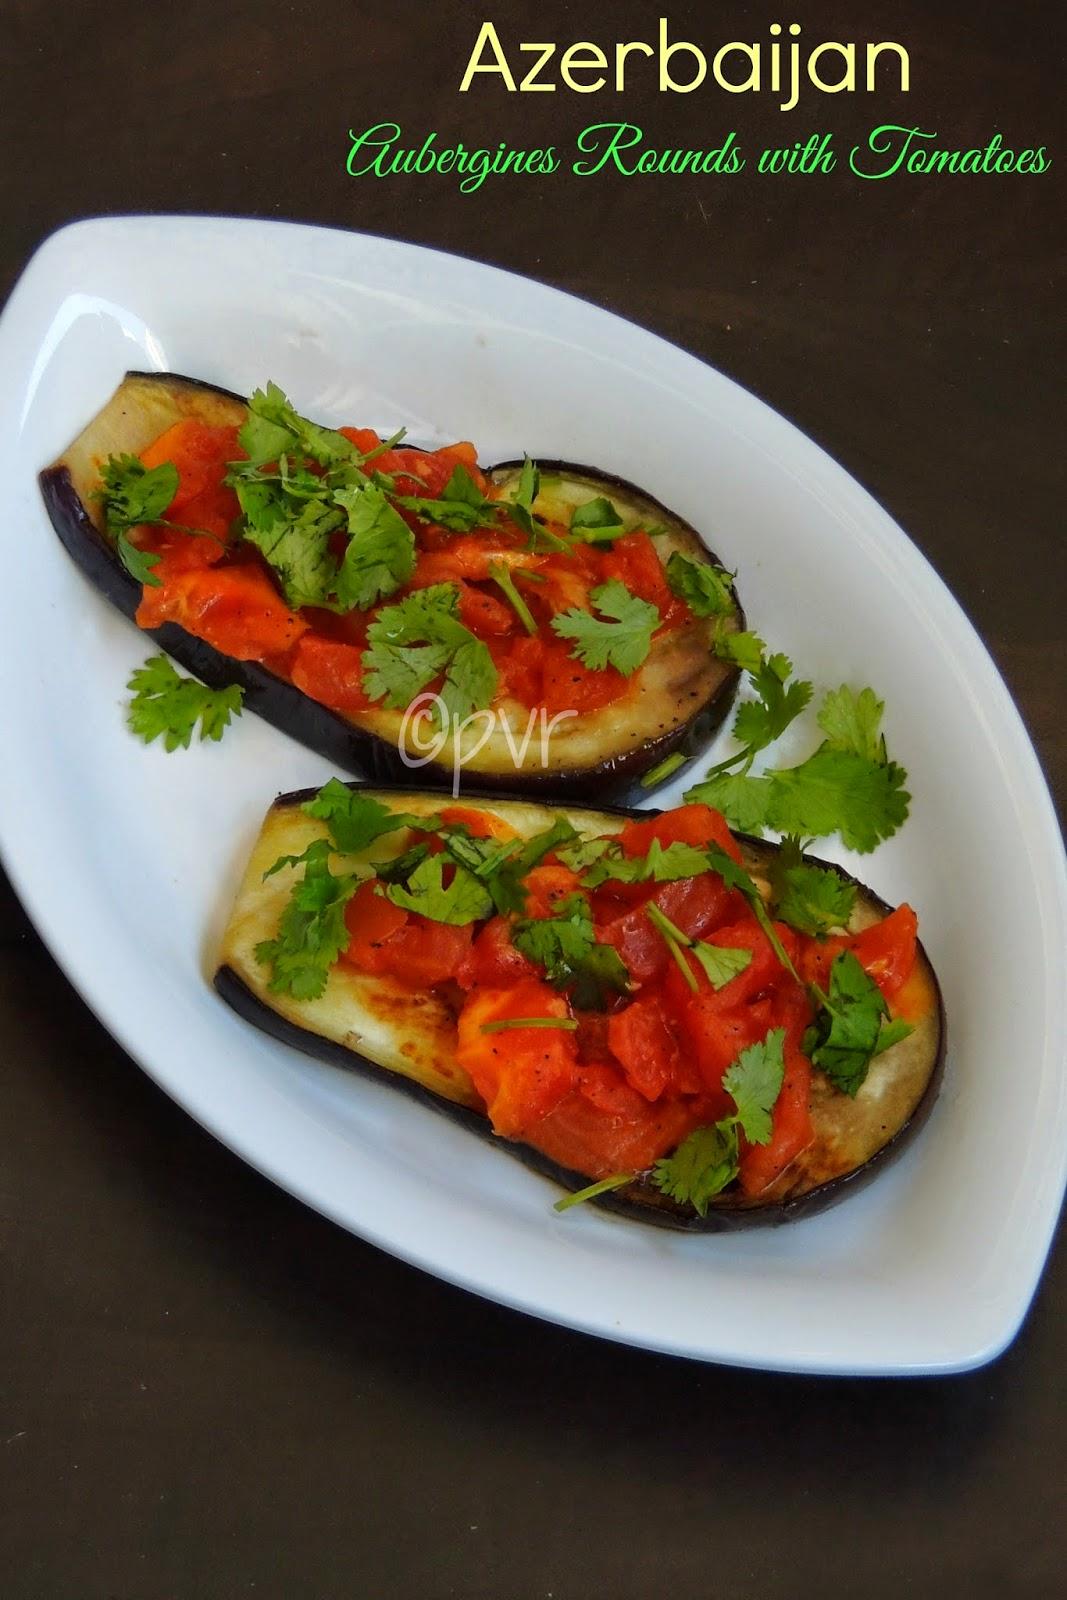 Priya's Versatile Recipes: Badimjan Dilchaklari - Aubergines